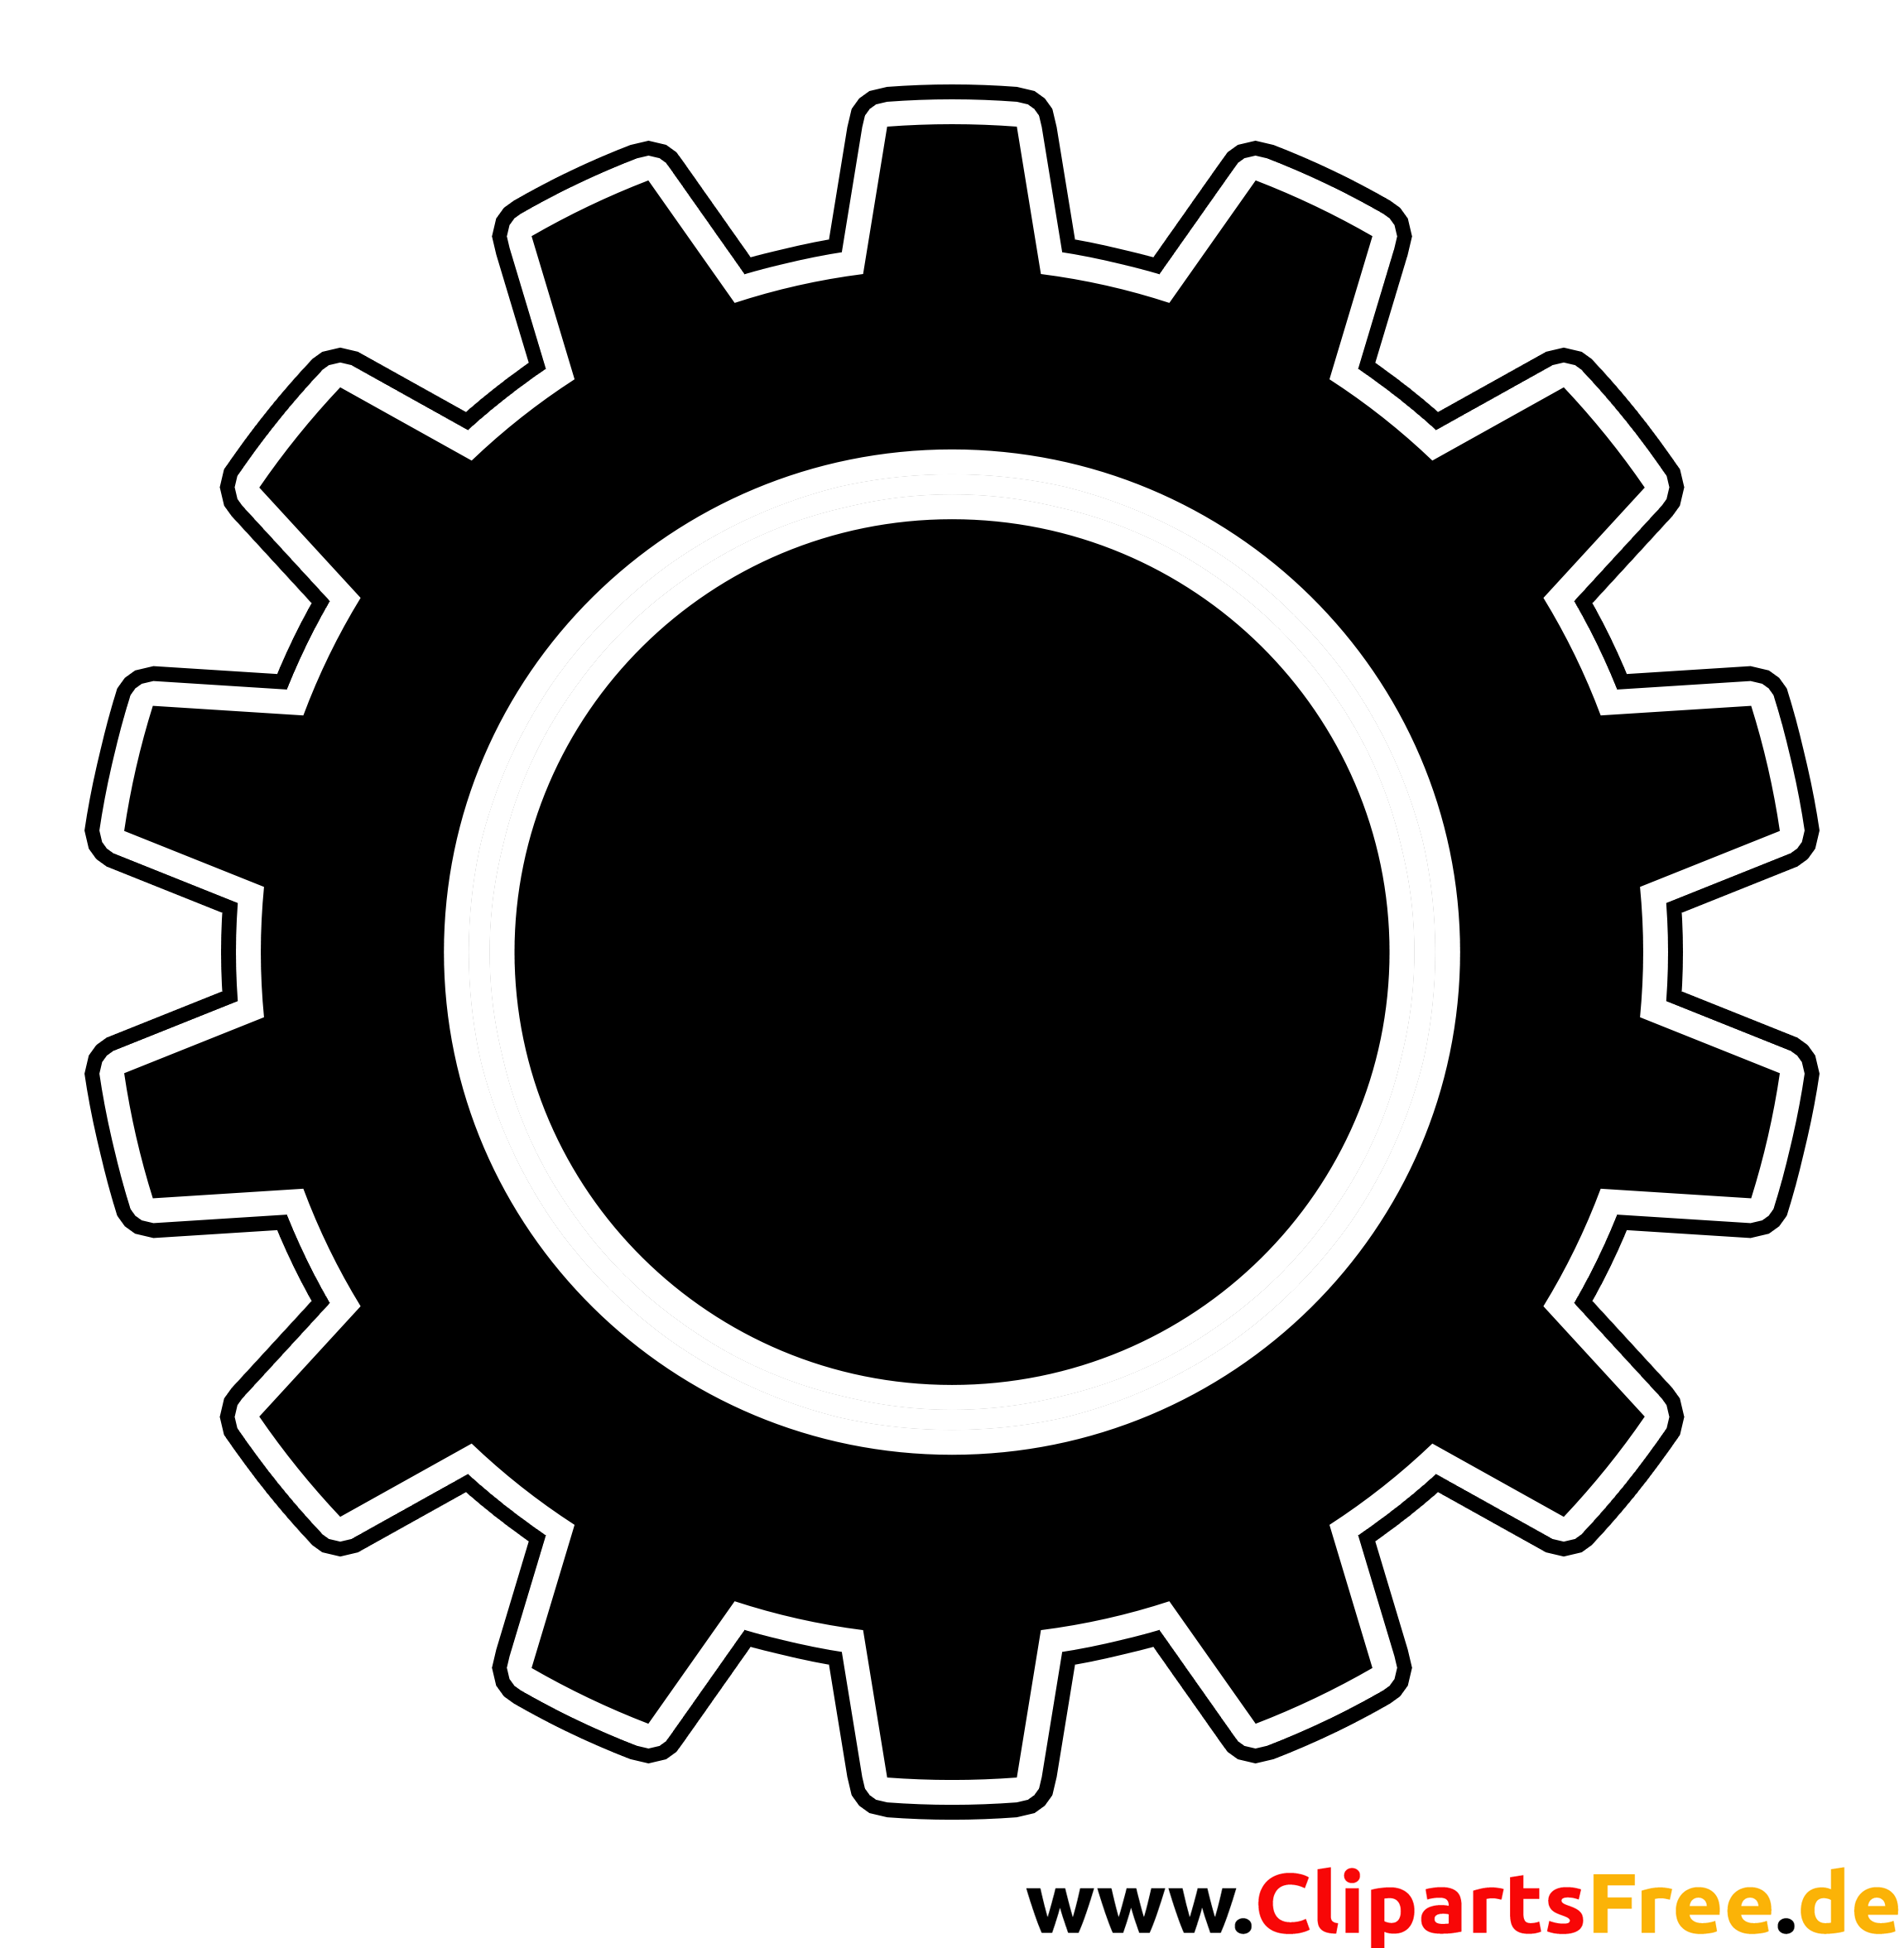 Zahnrad kostenloses Bild-Clipart